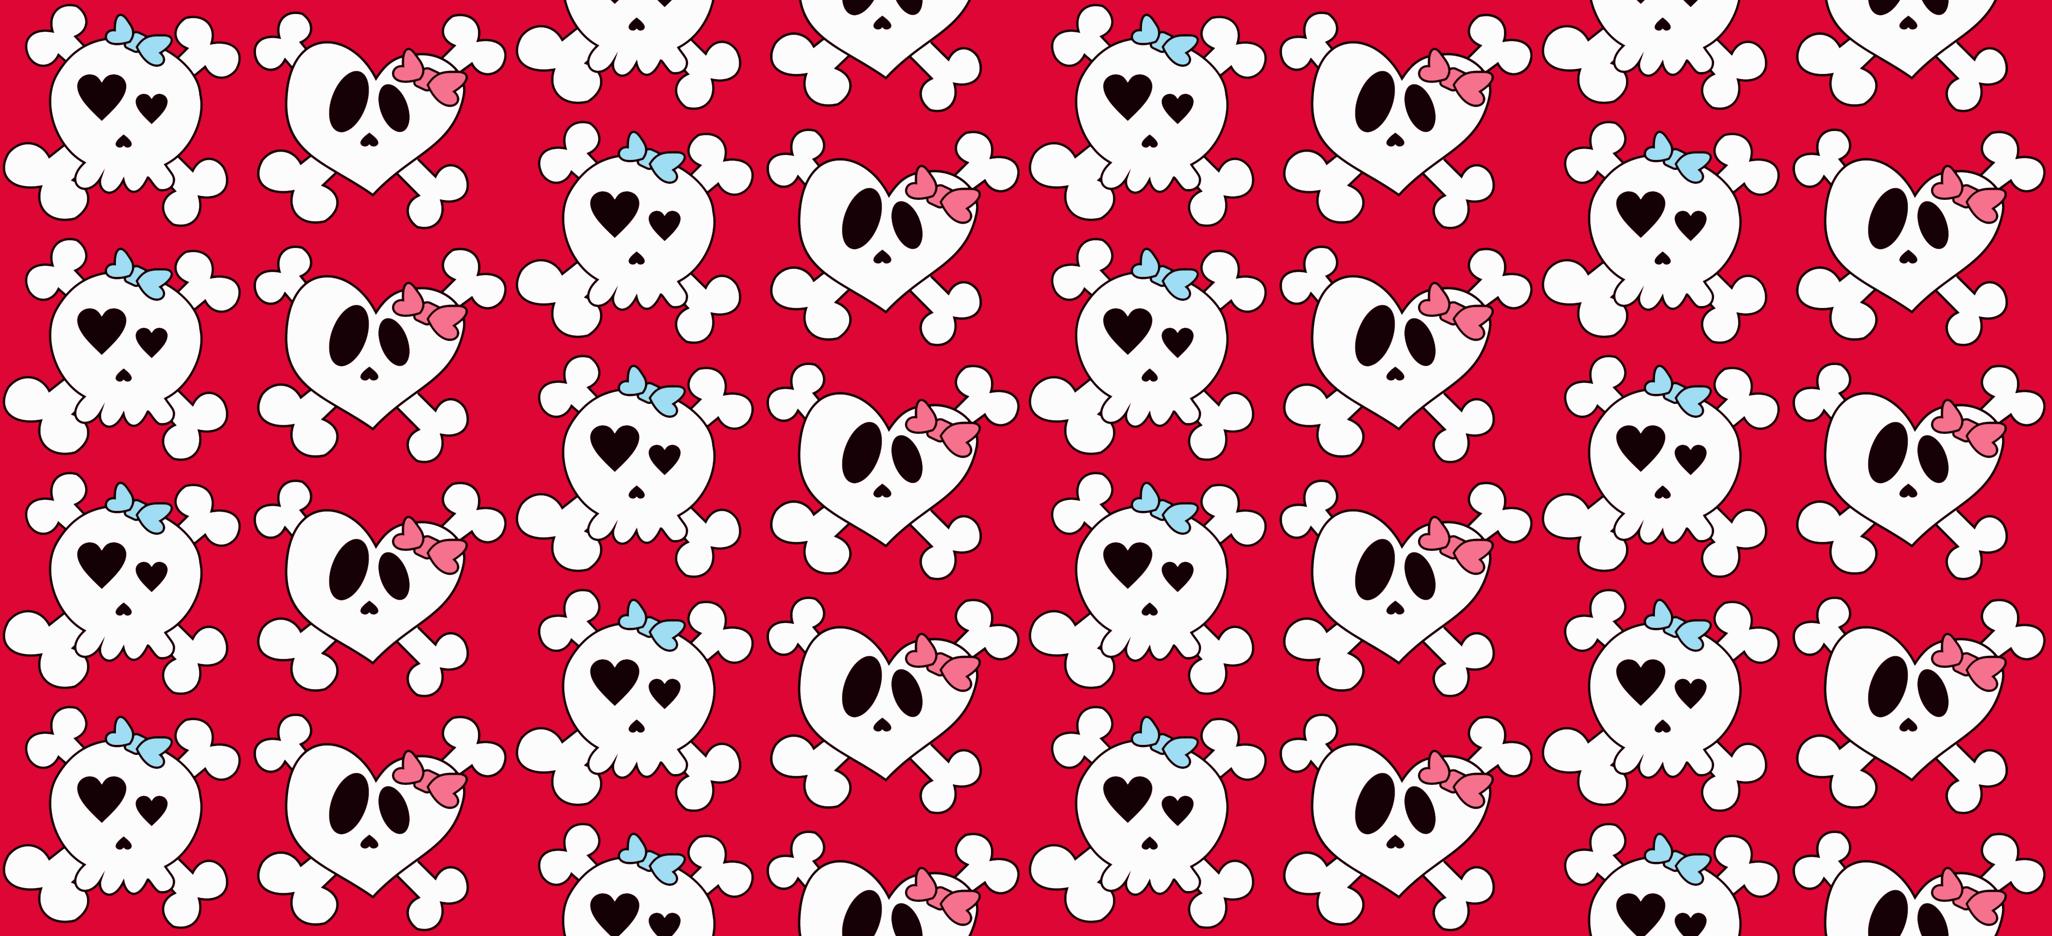 Girly Skull Wallpaper Girly skulls 2052x936